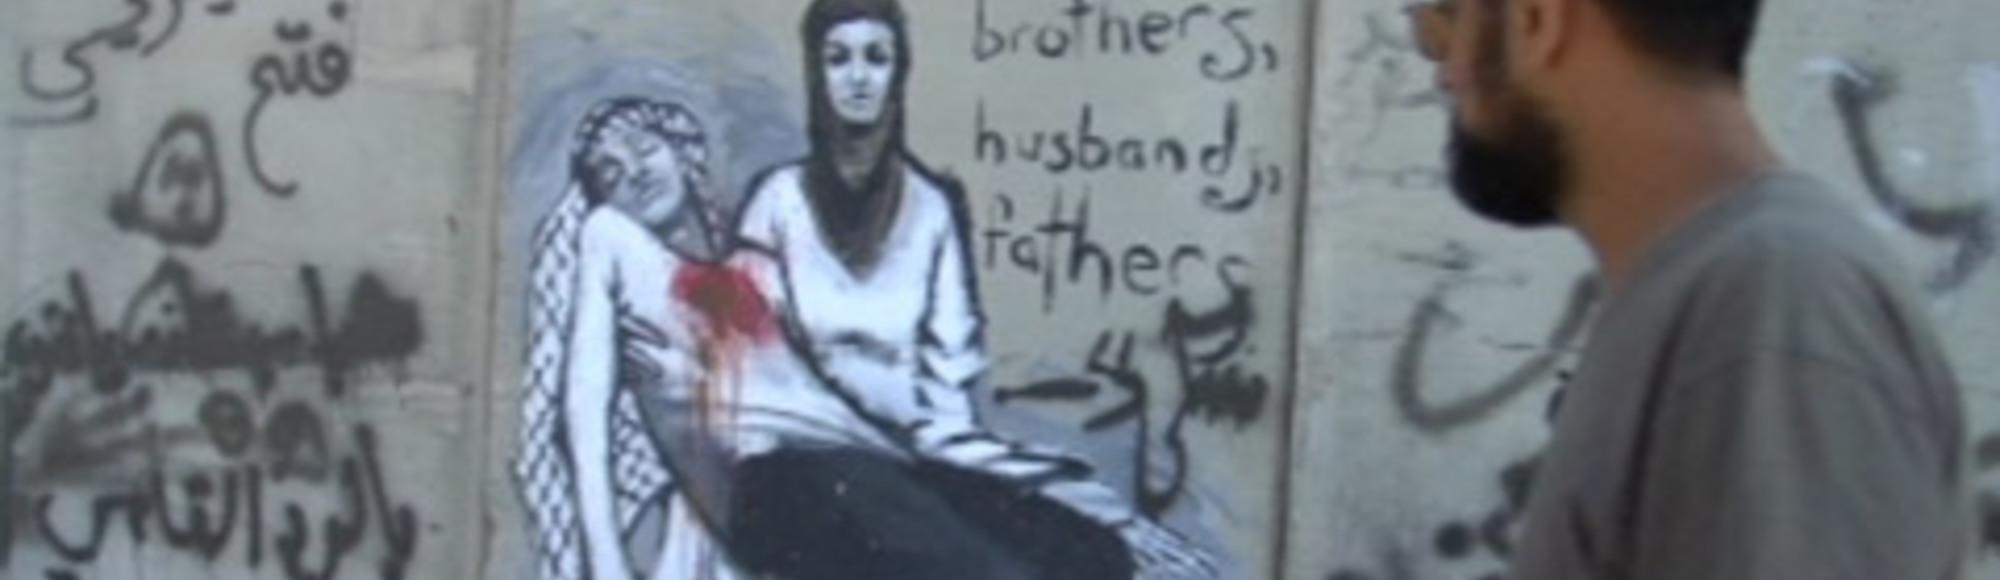 Palestine Vs. Israel - Against the Wall